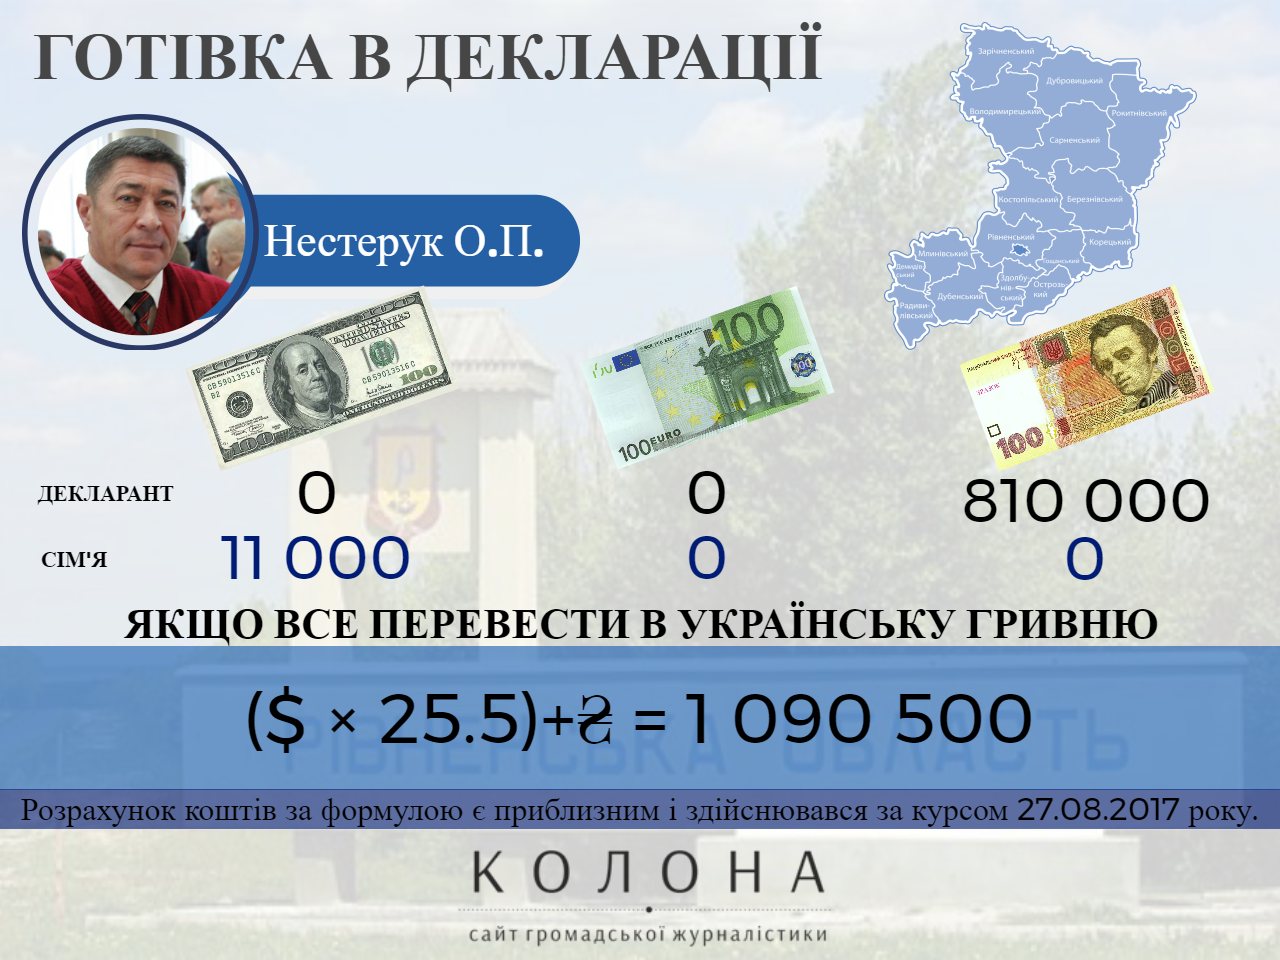 Нестерук Олександр Петрович